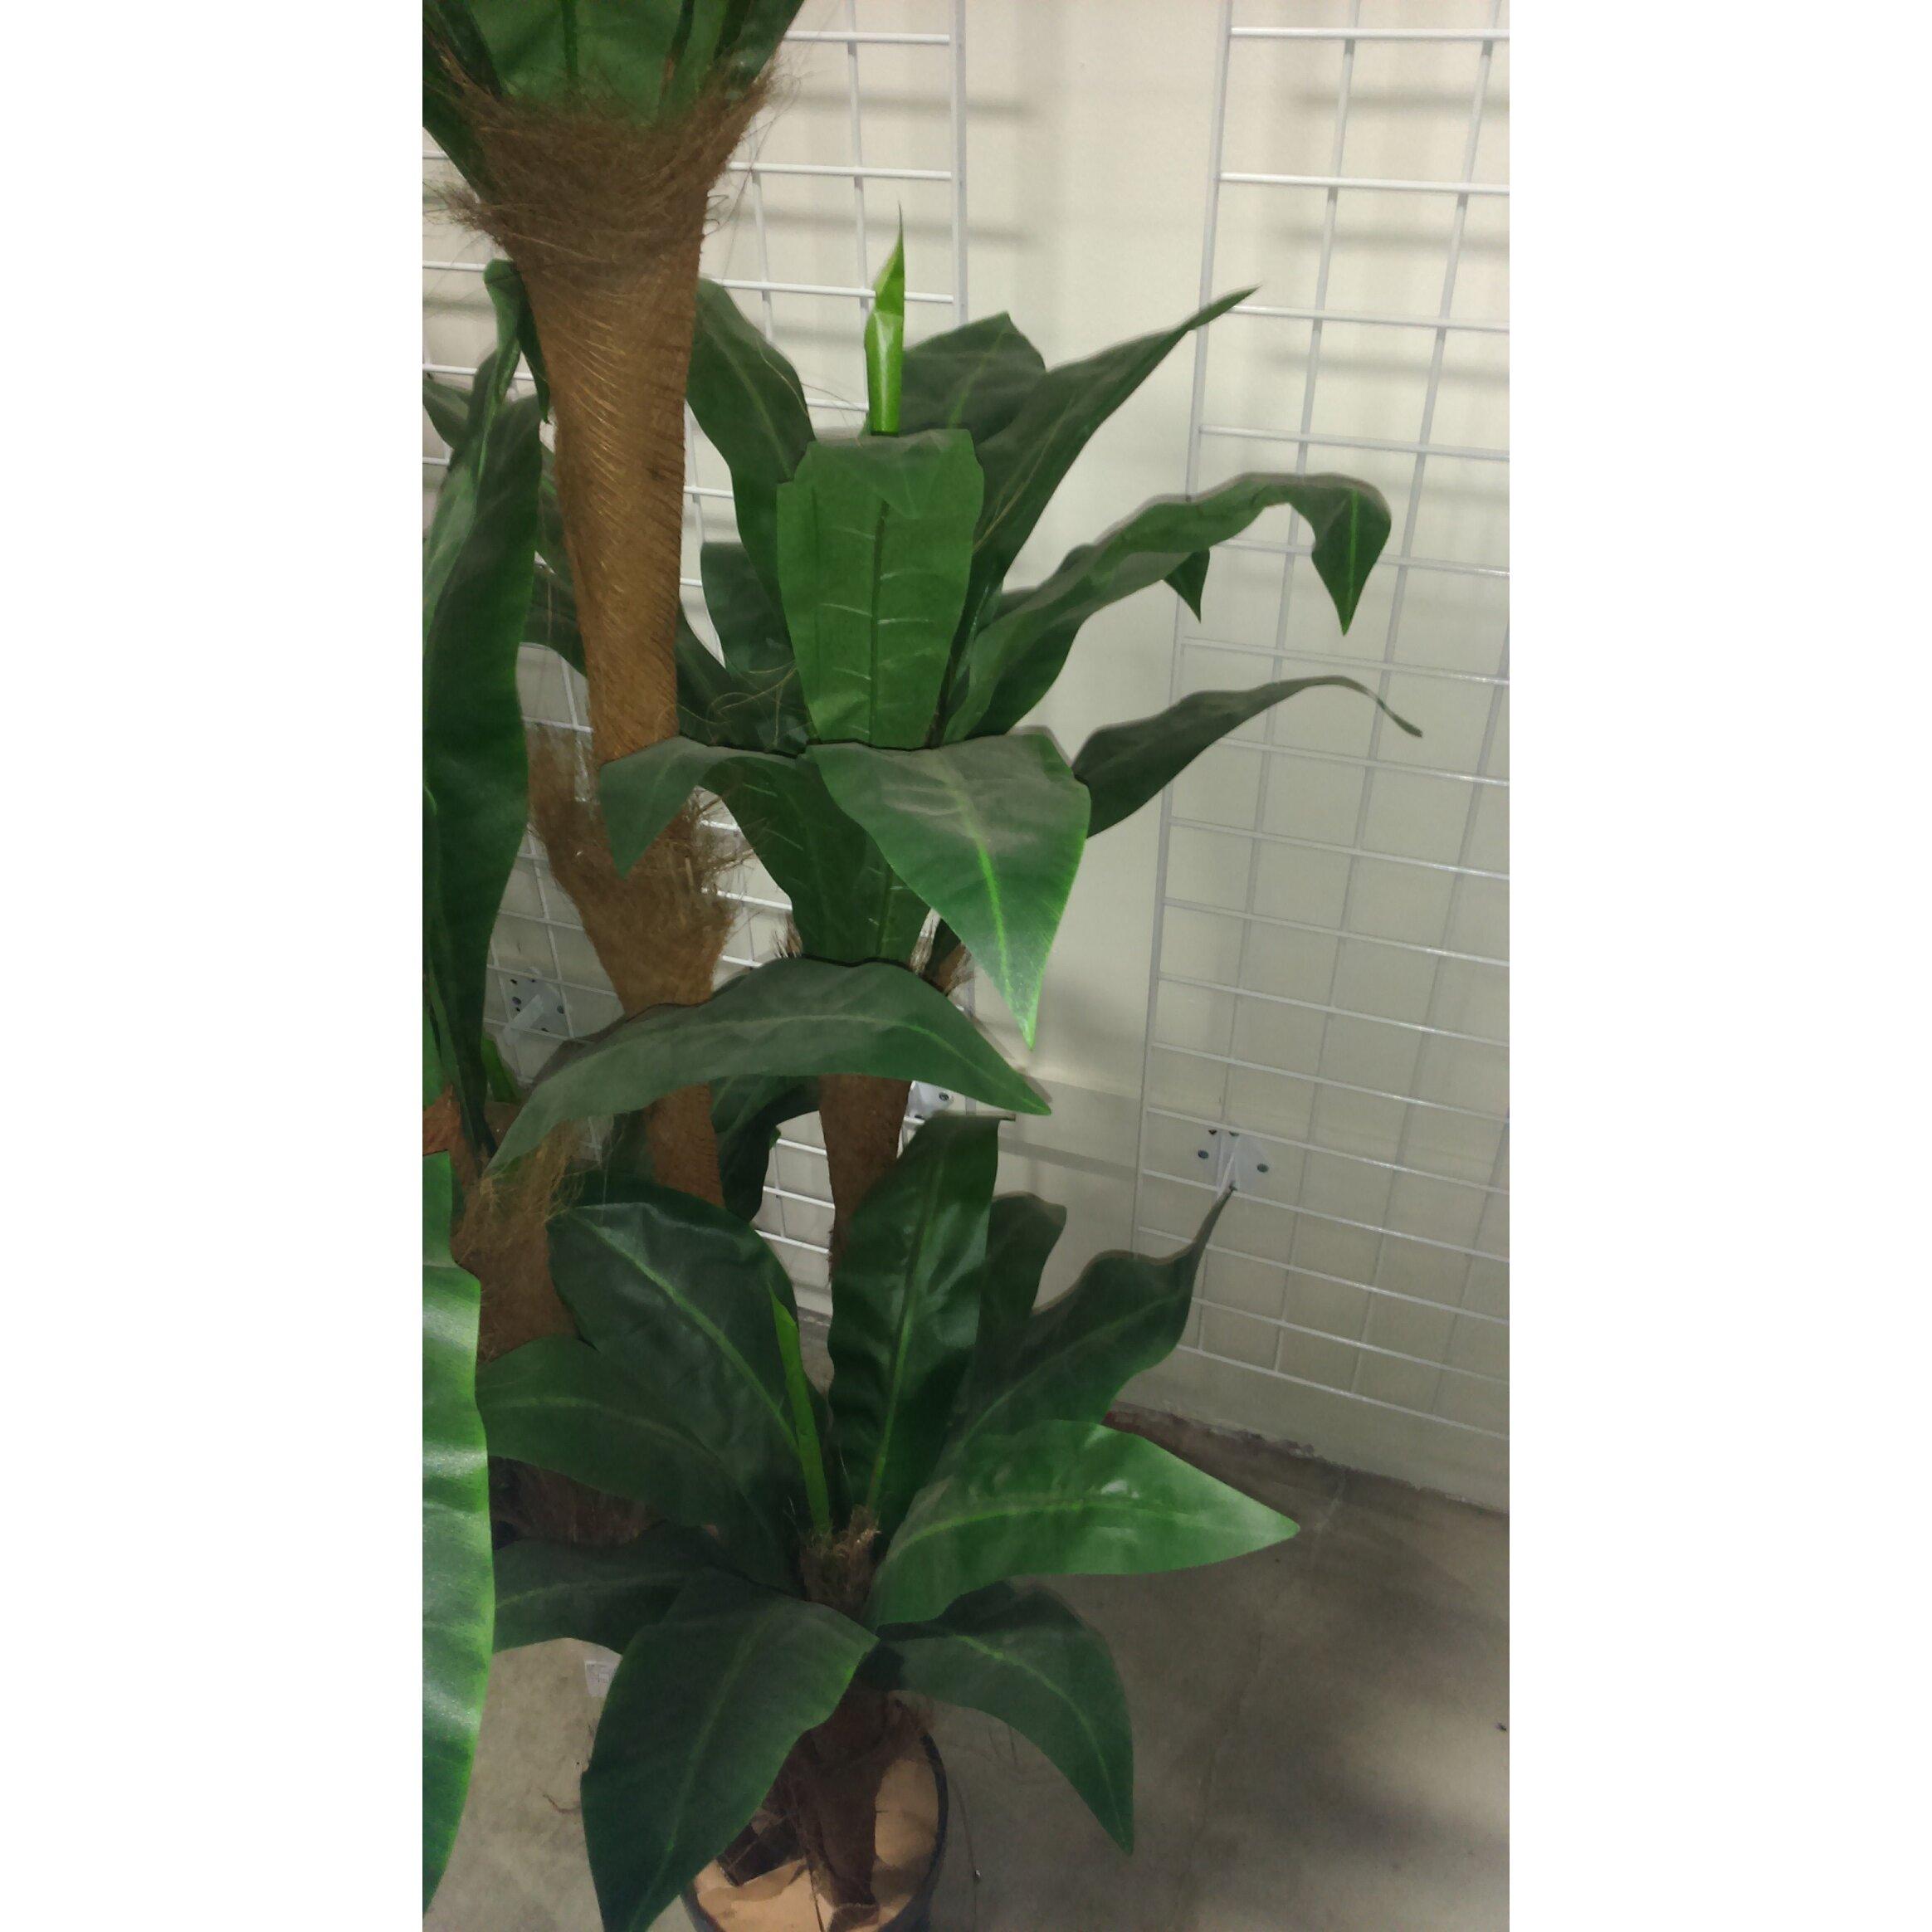 Admiredbynature Foliage Bird Nest Tree Floor Plant In Pot